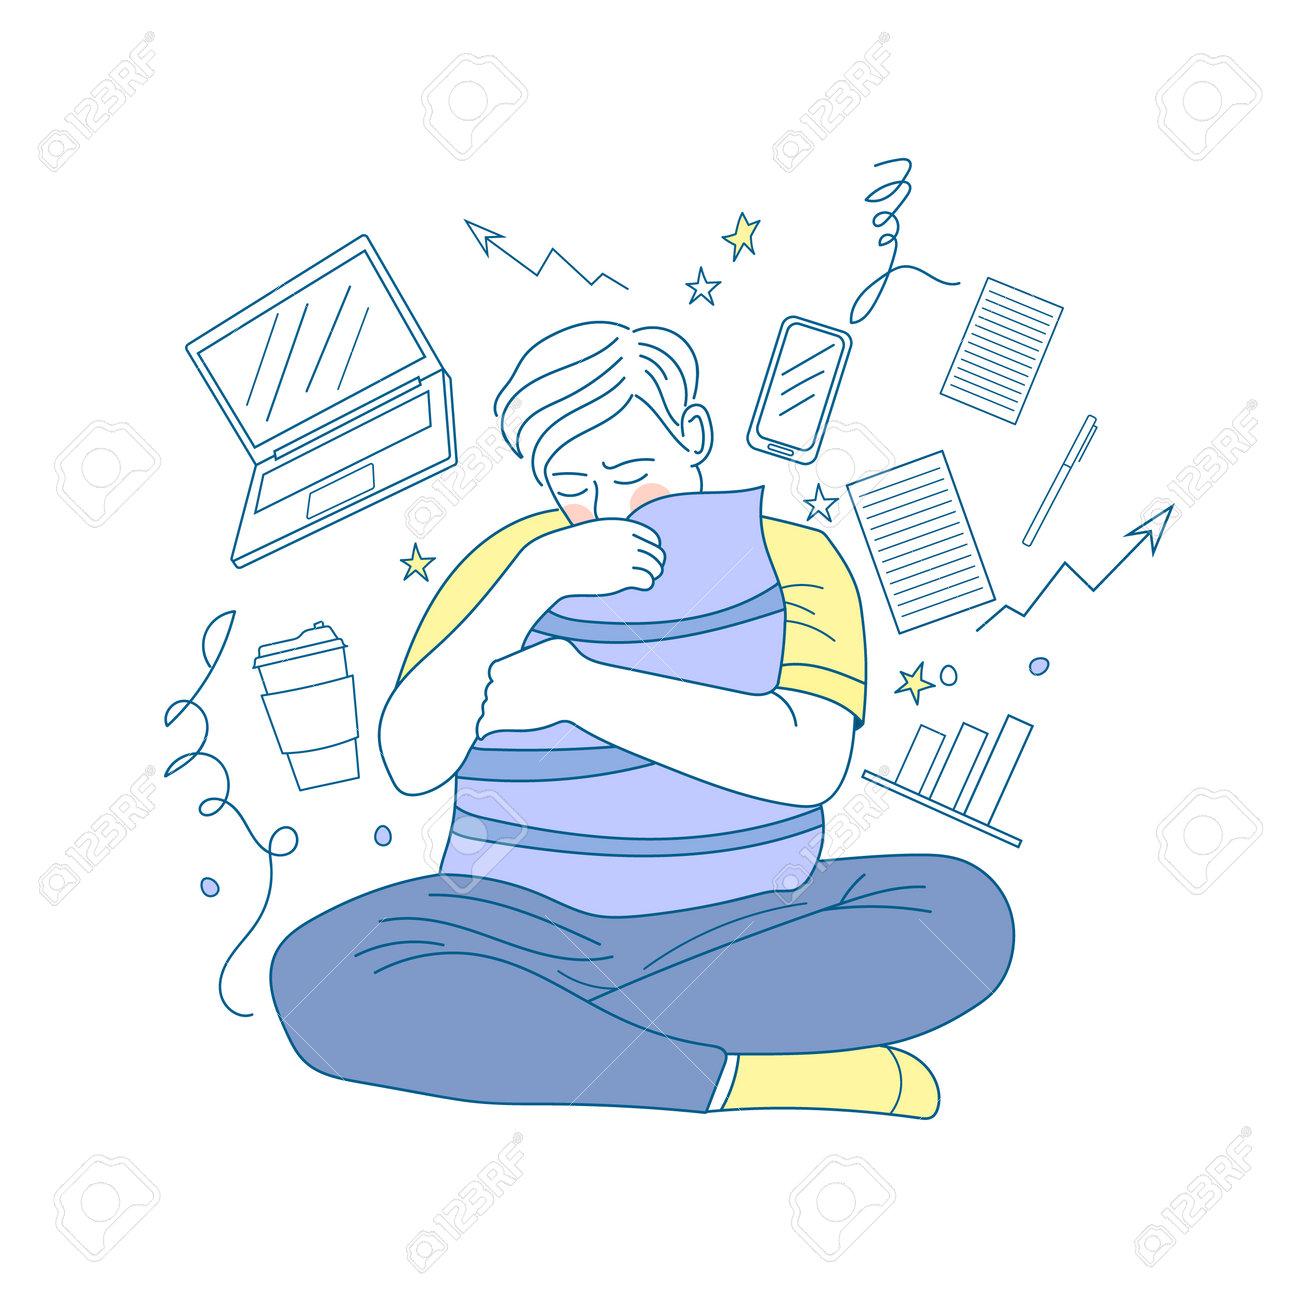 Sad guy depressed from hard work. Unhappy man. Mental strain. - 161909302